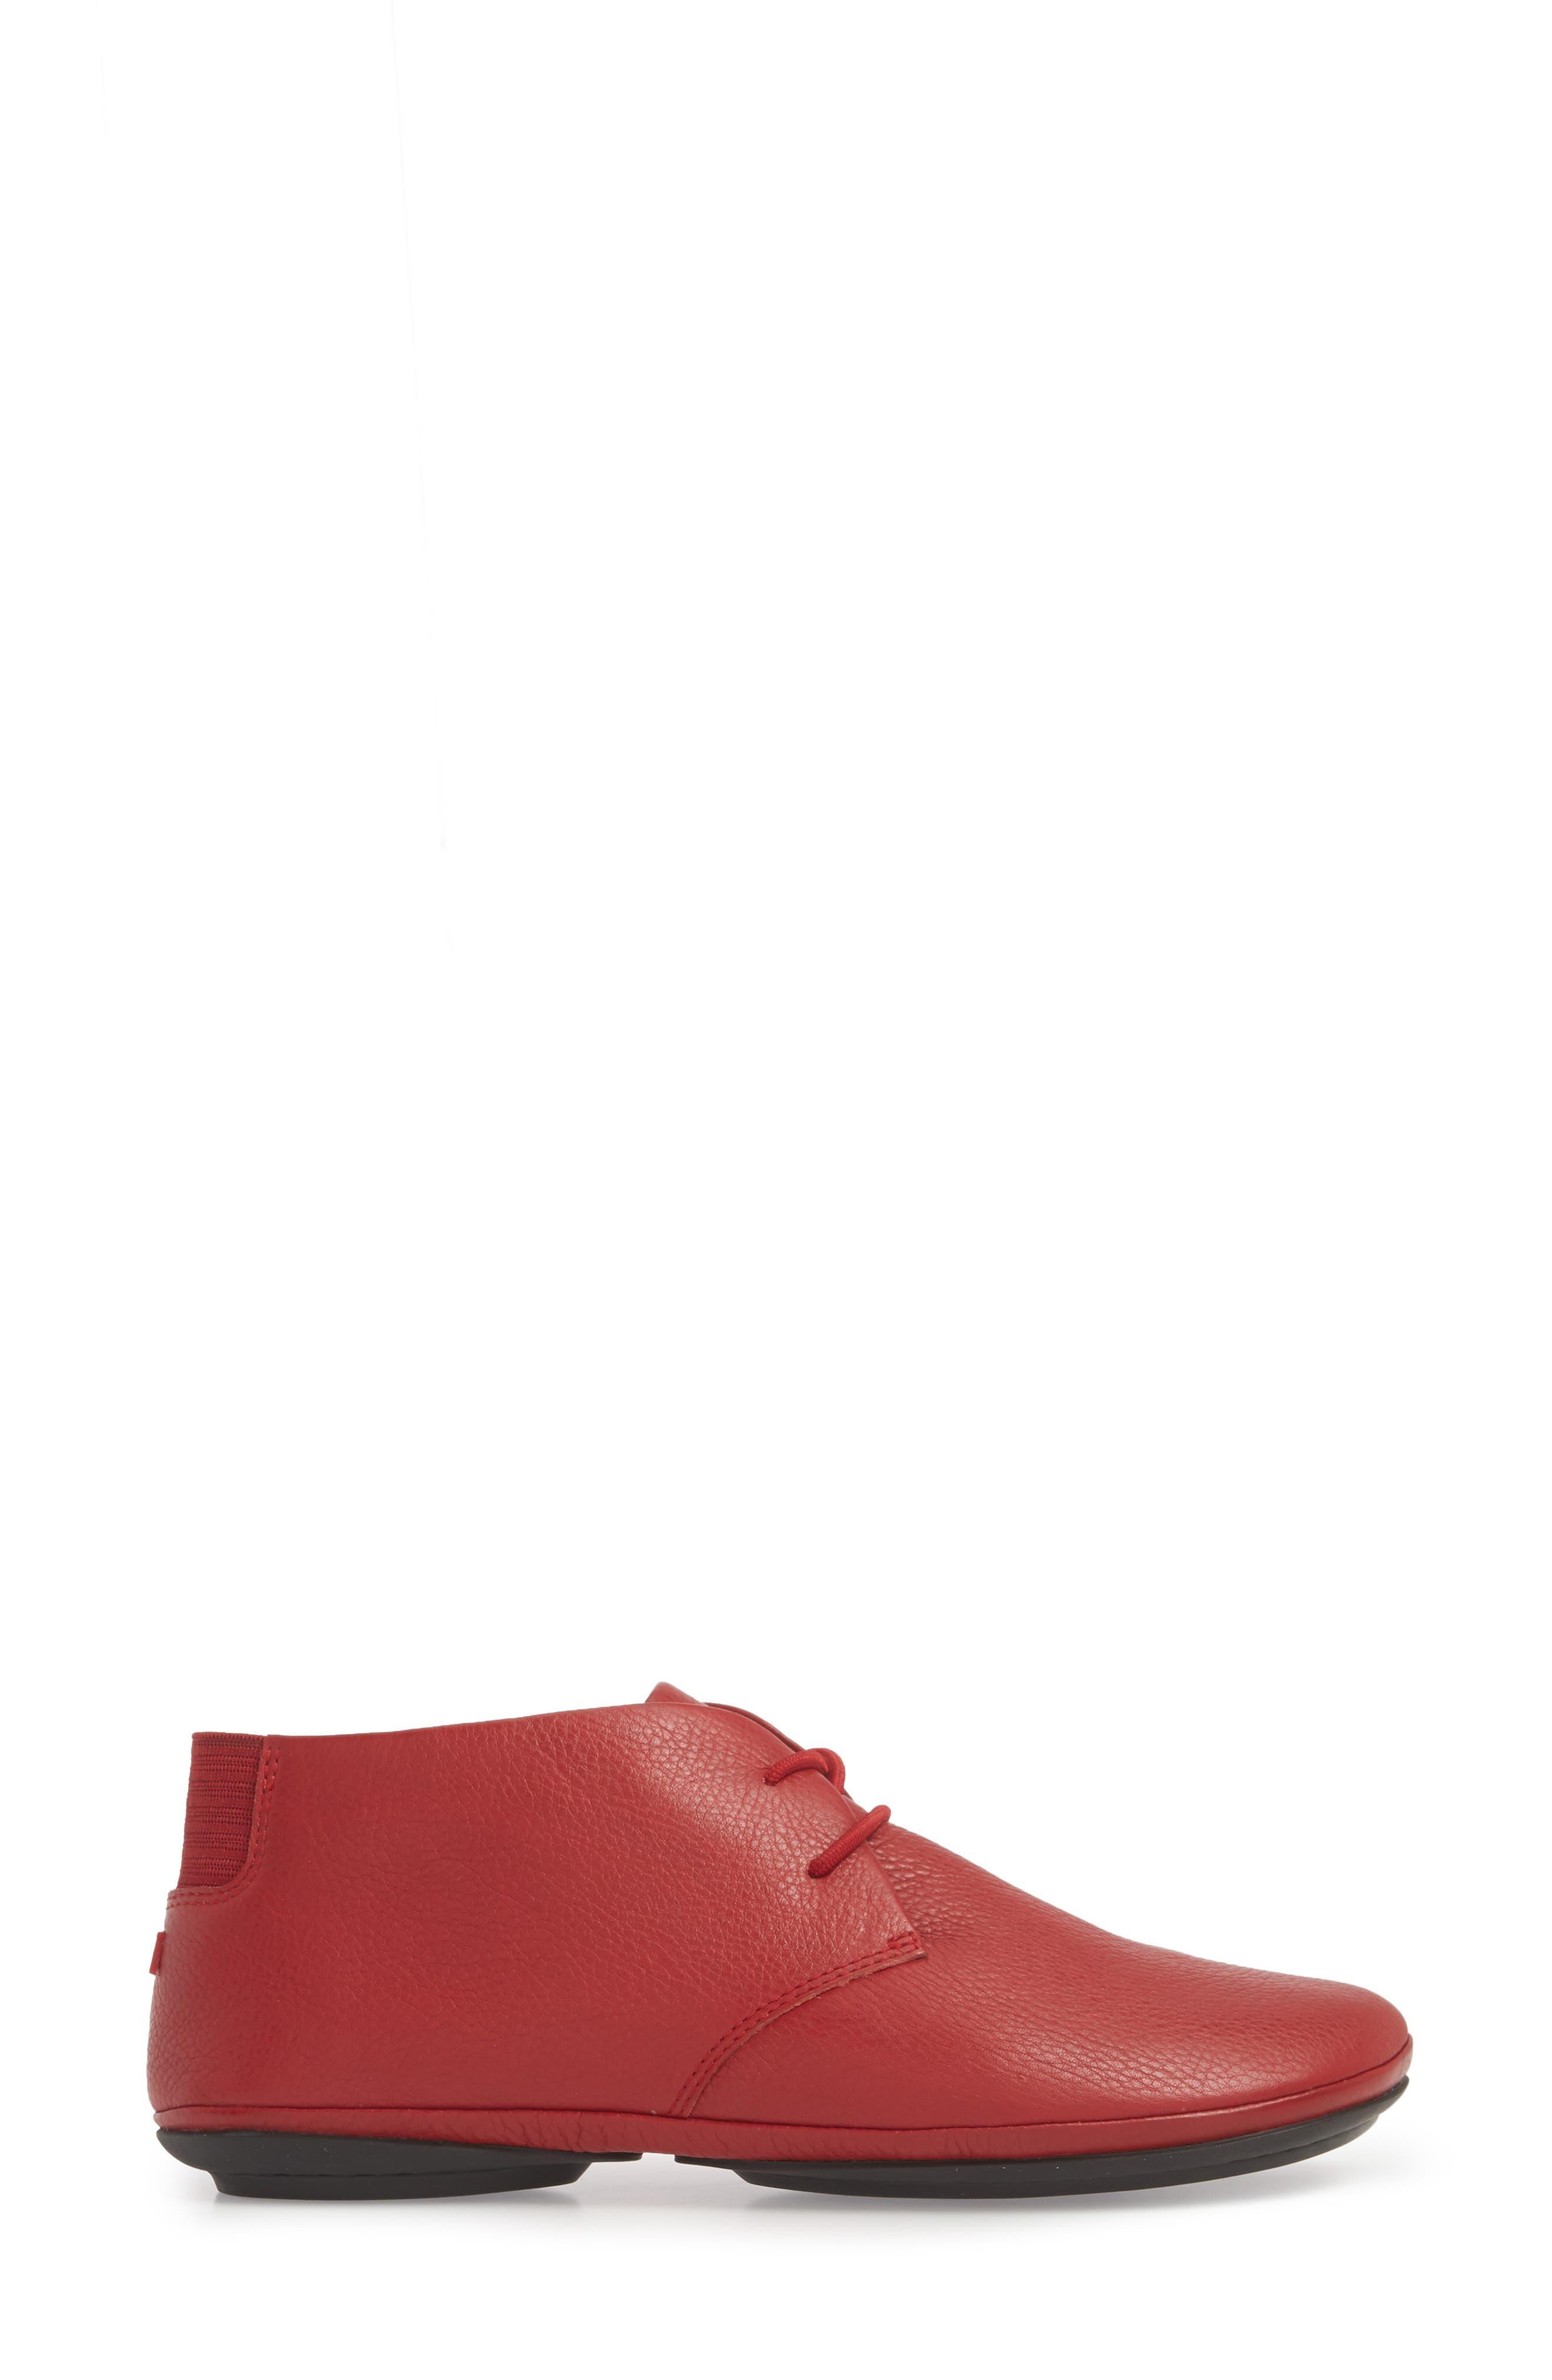 CAMPER, Right Nina Desert Boot, Alternate thumbnail 3, color, MEDIUM RED LEATHER